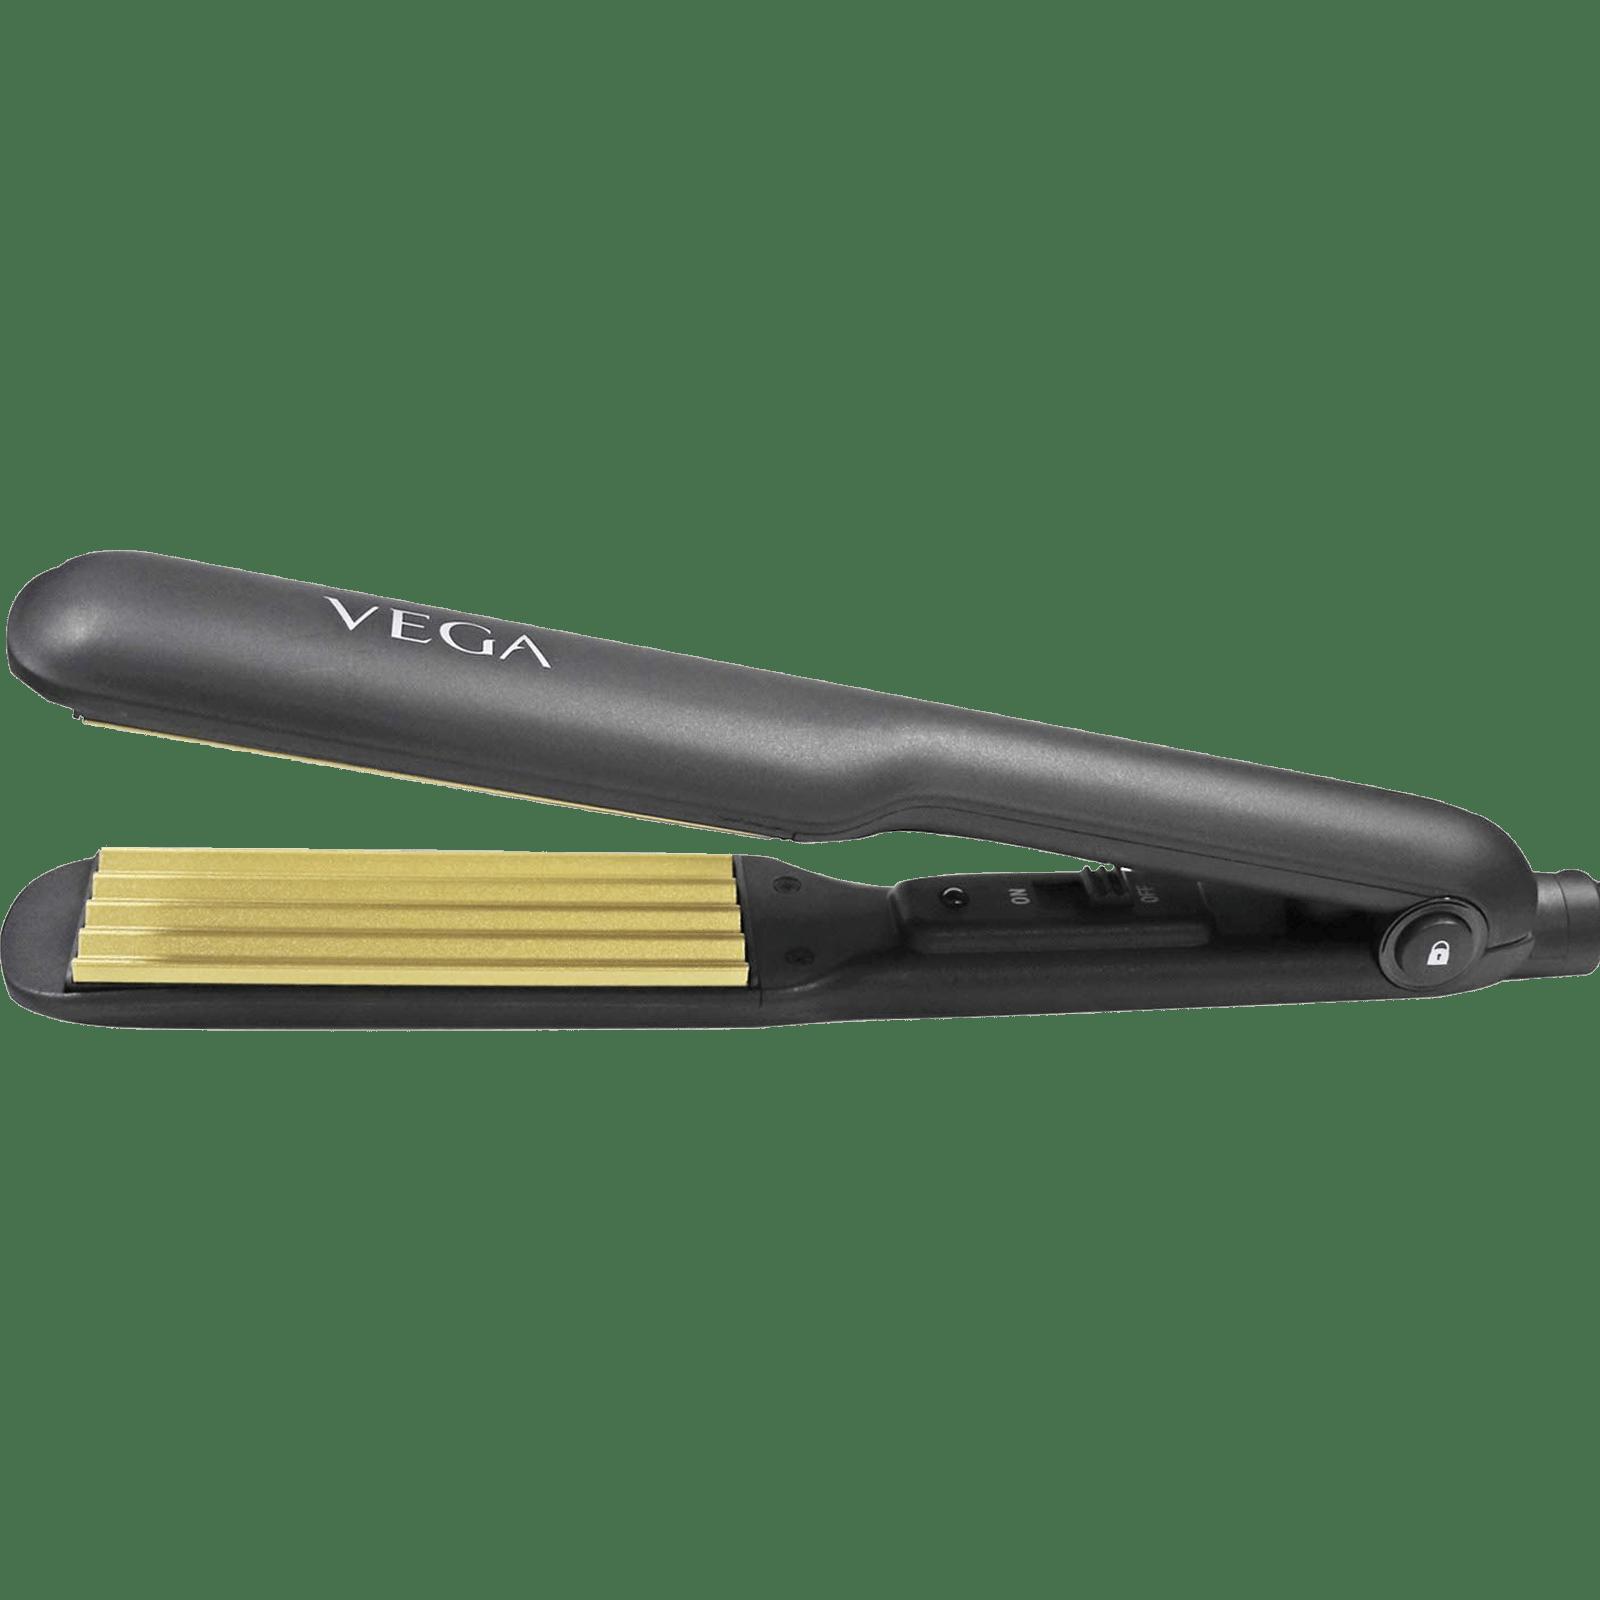 Vega Hair Crimper (Wide Ceramic Coated Crimper Plates, VHCR-01, Black)